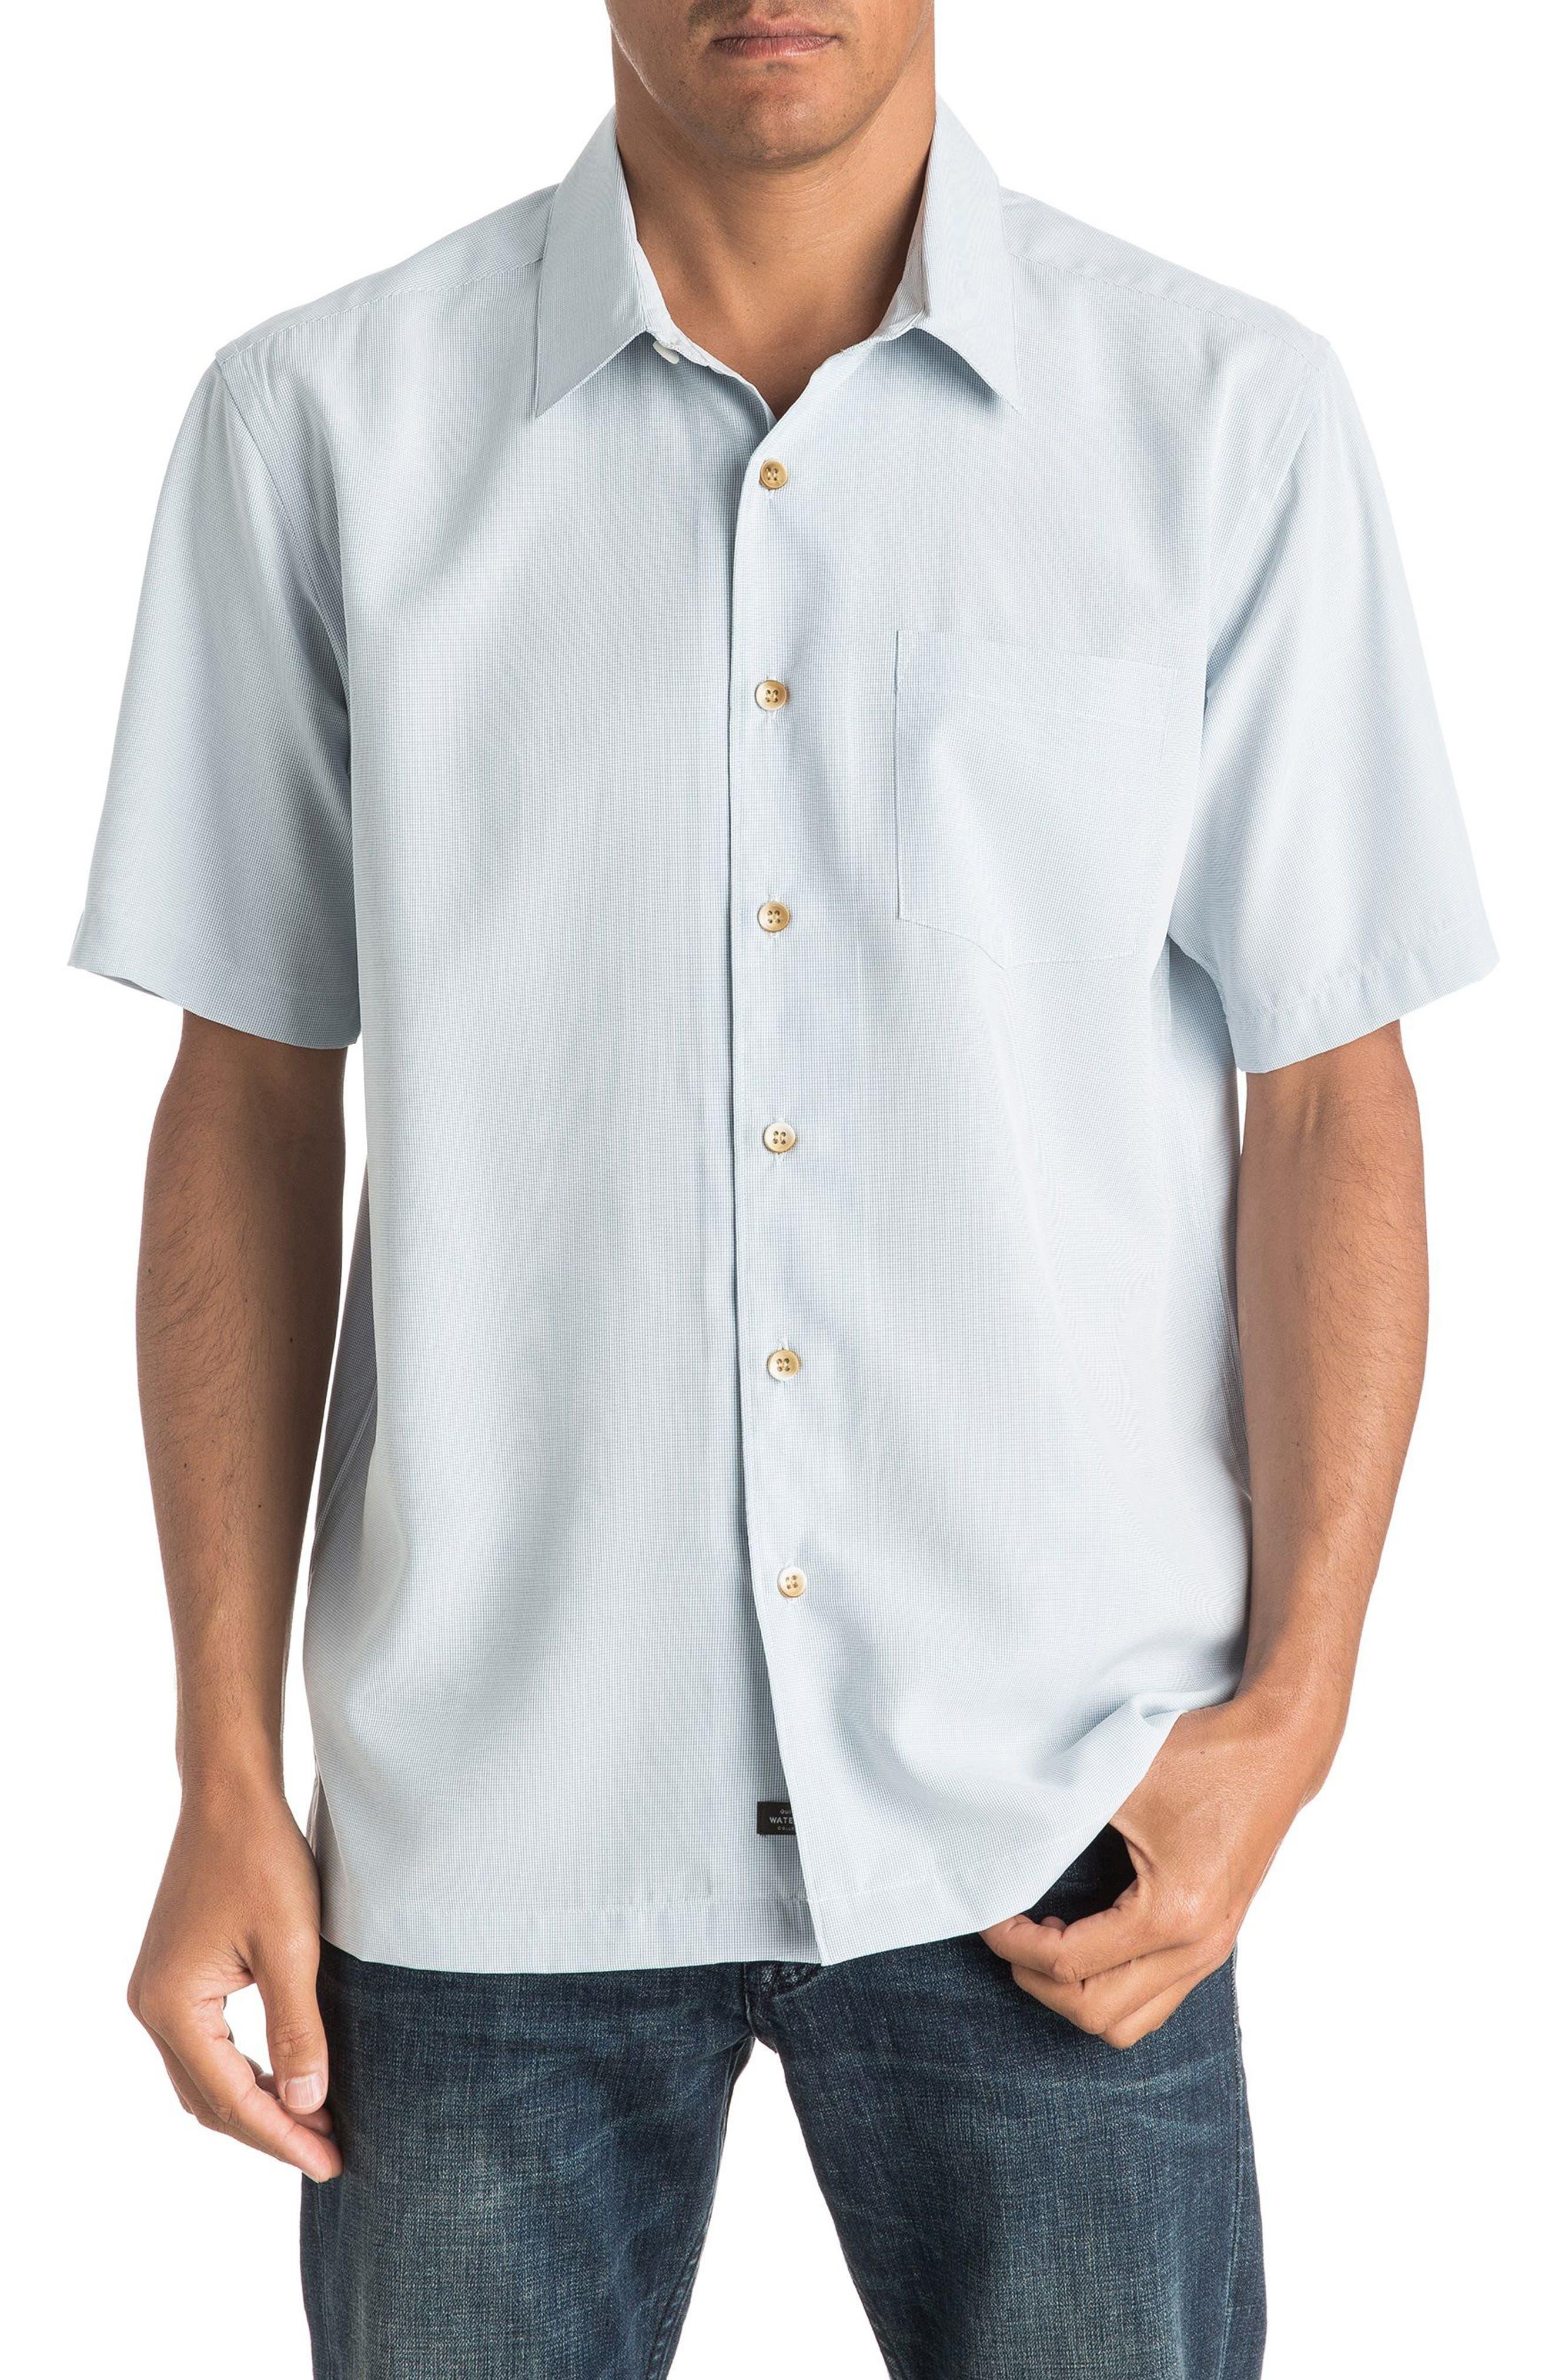 Main Image - Quiksilver Waterman Collection 'Cane Island' Regular Fit Short Sleeve Sport Shirt